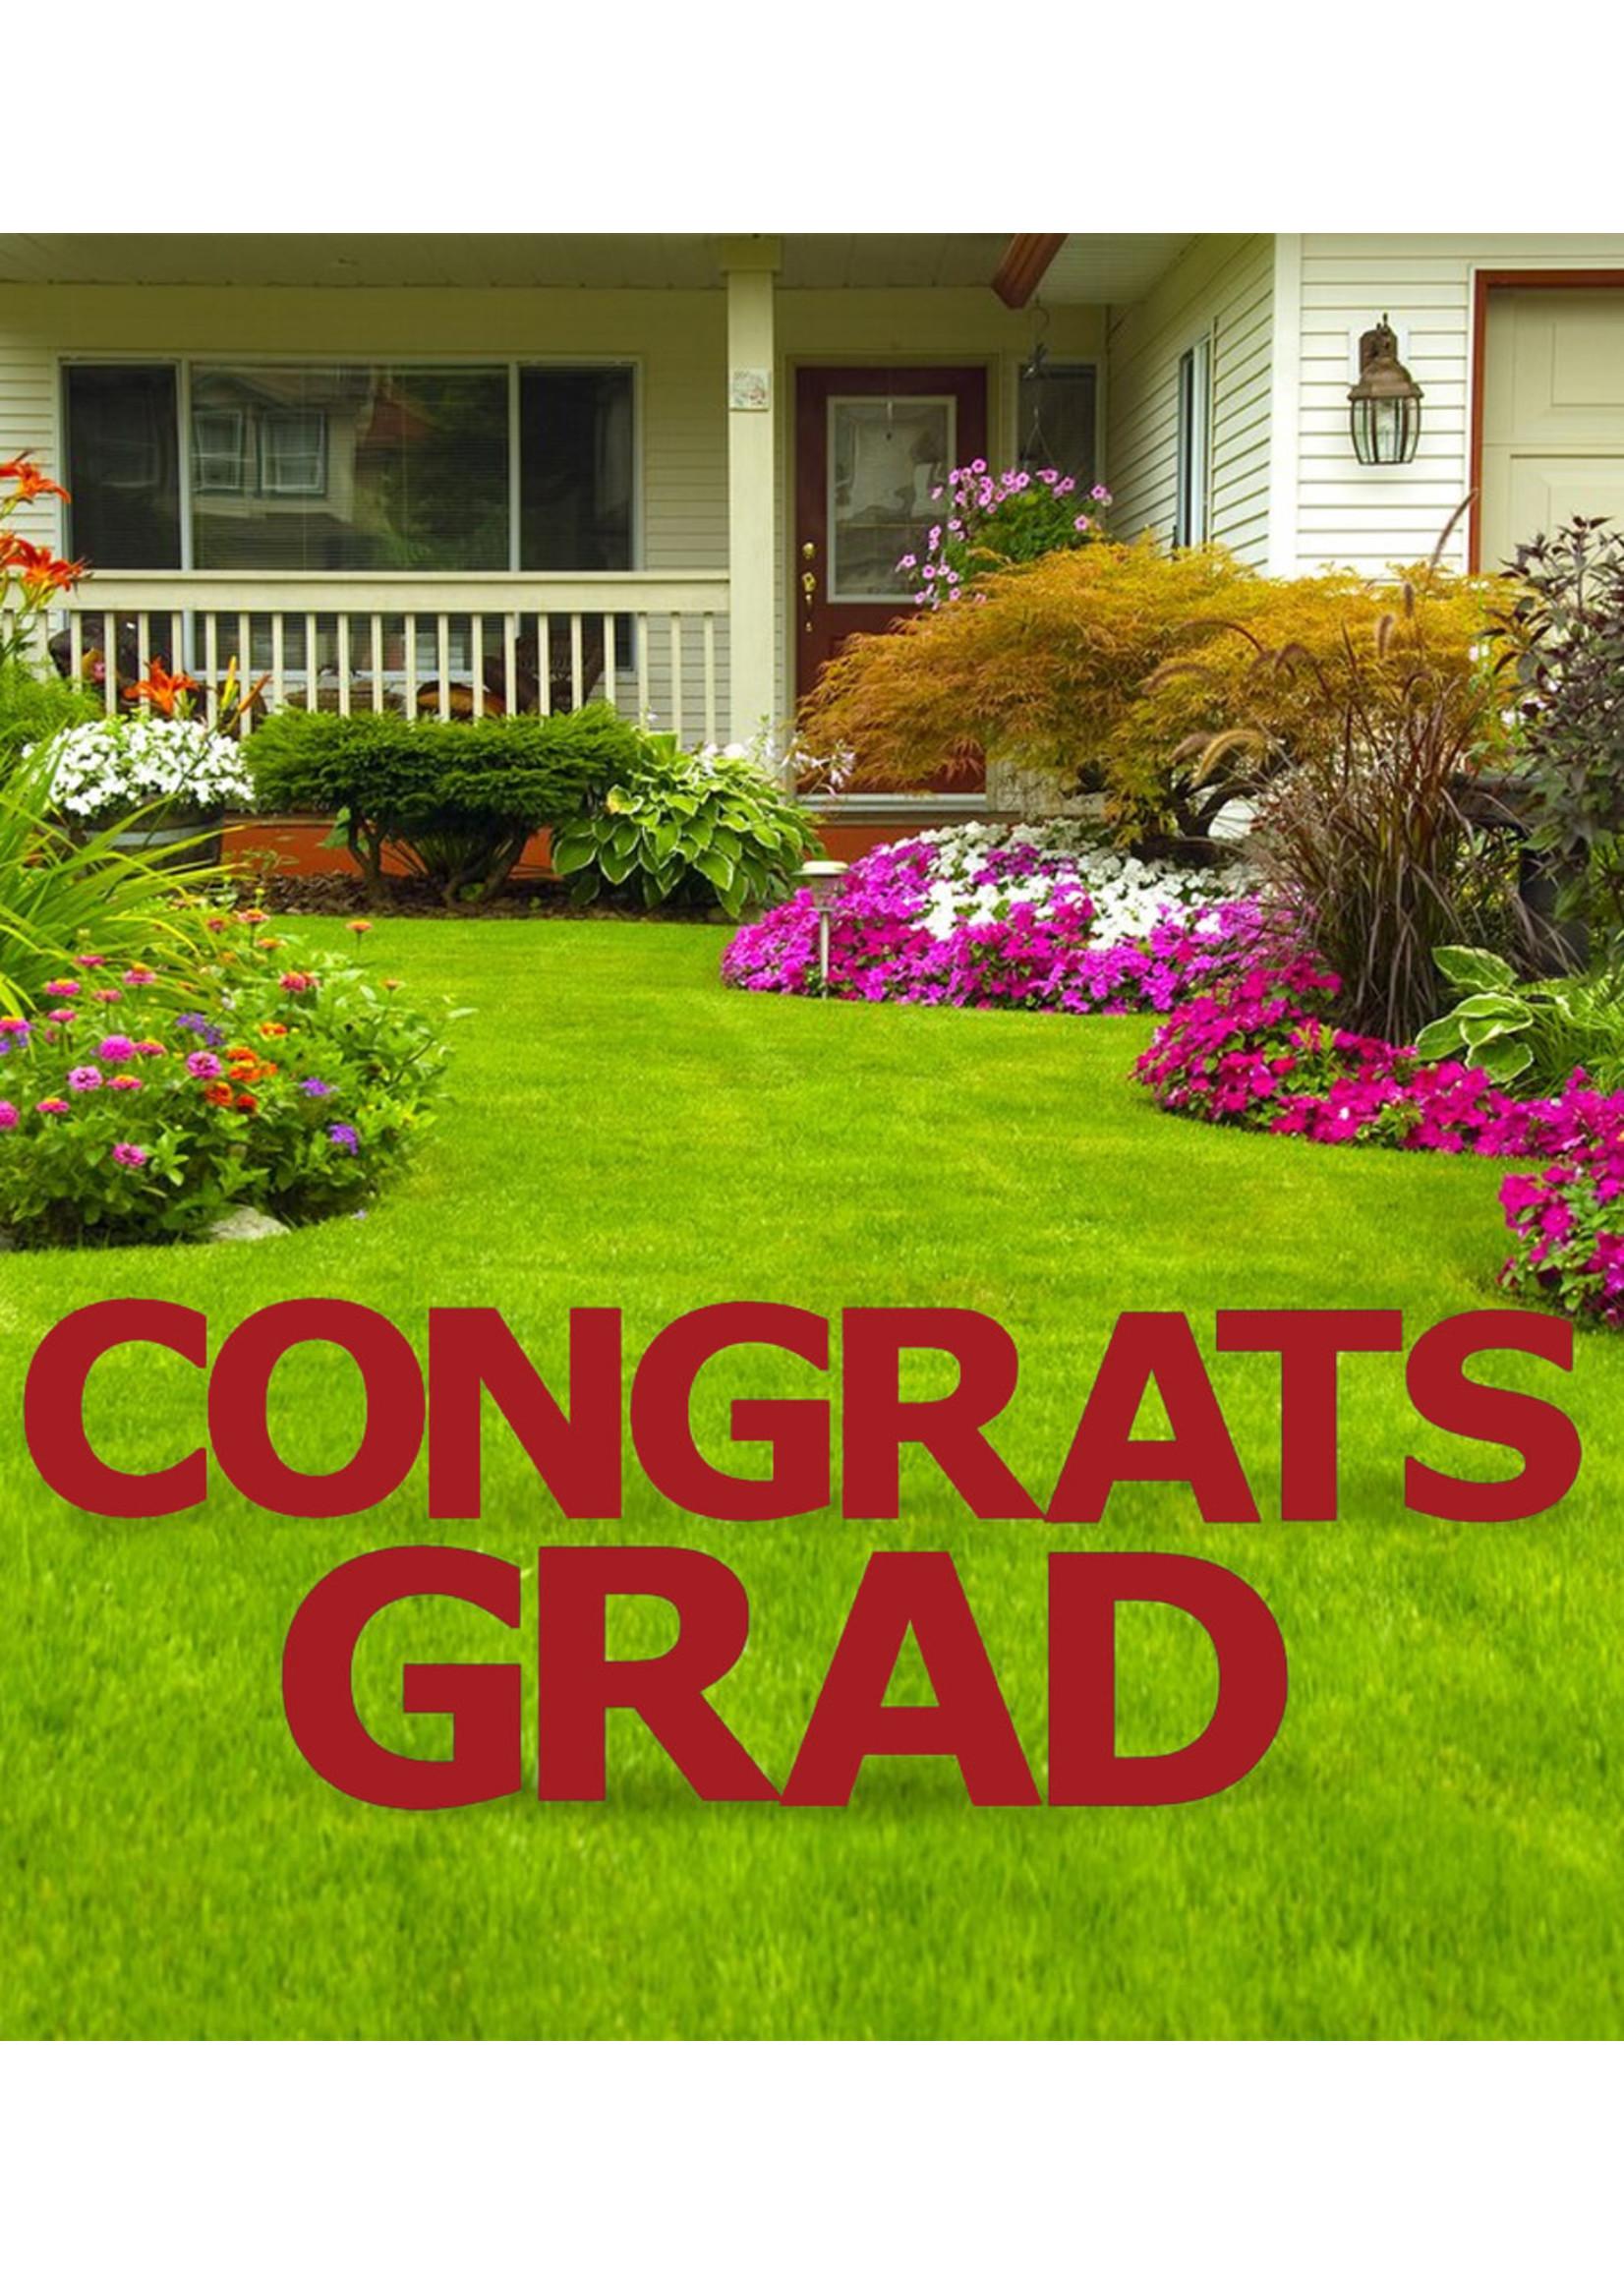 Congrats Grad Red Yard Signs